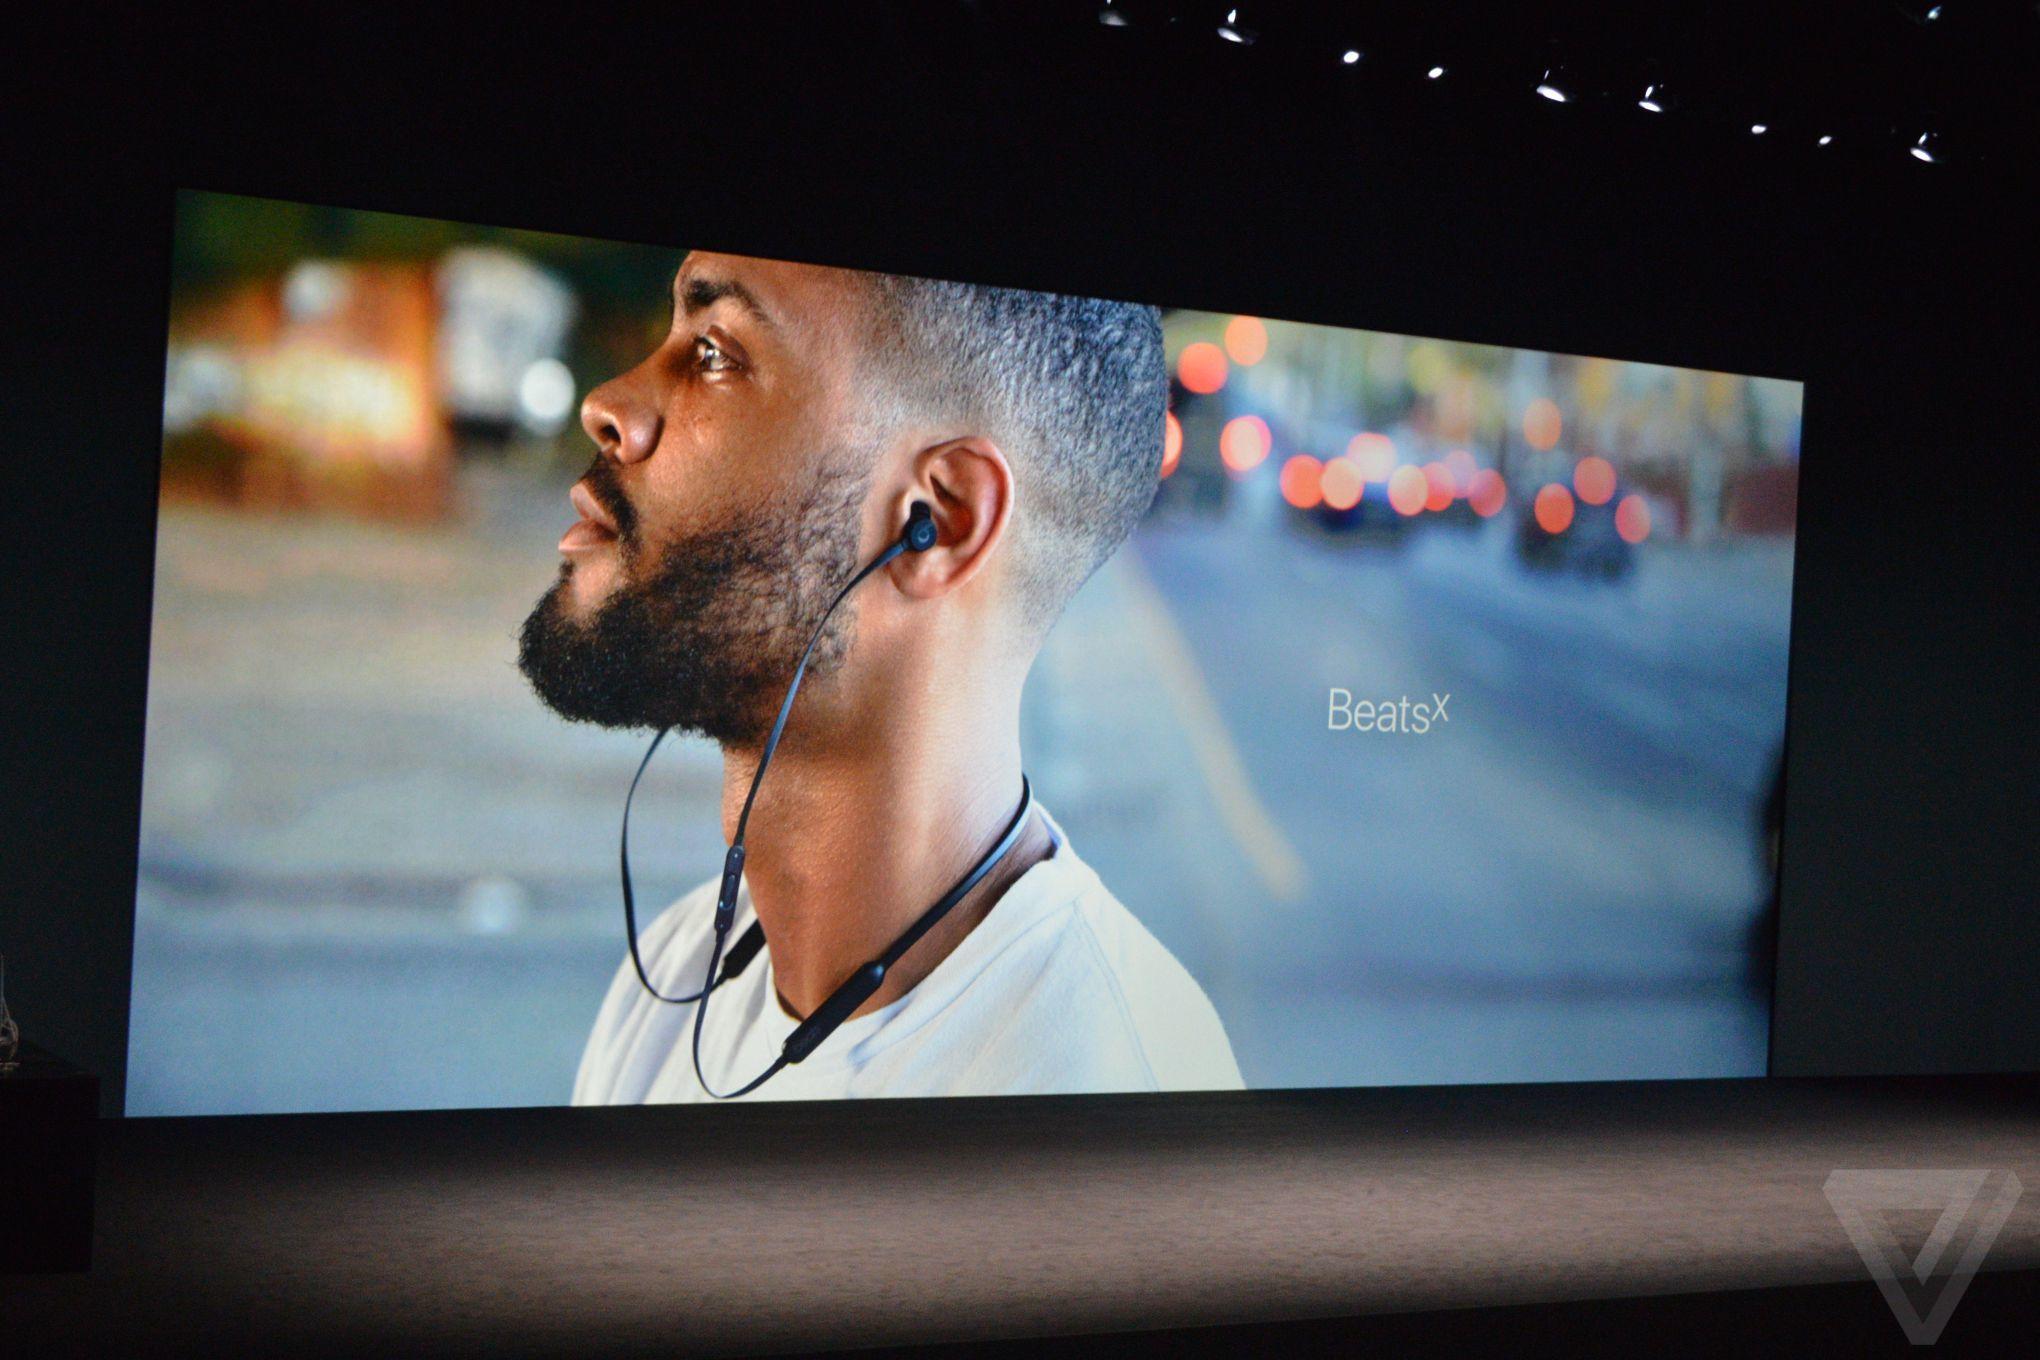 apple-iphone-watch-20160907-5368